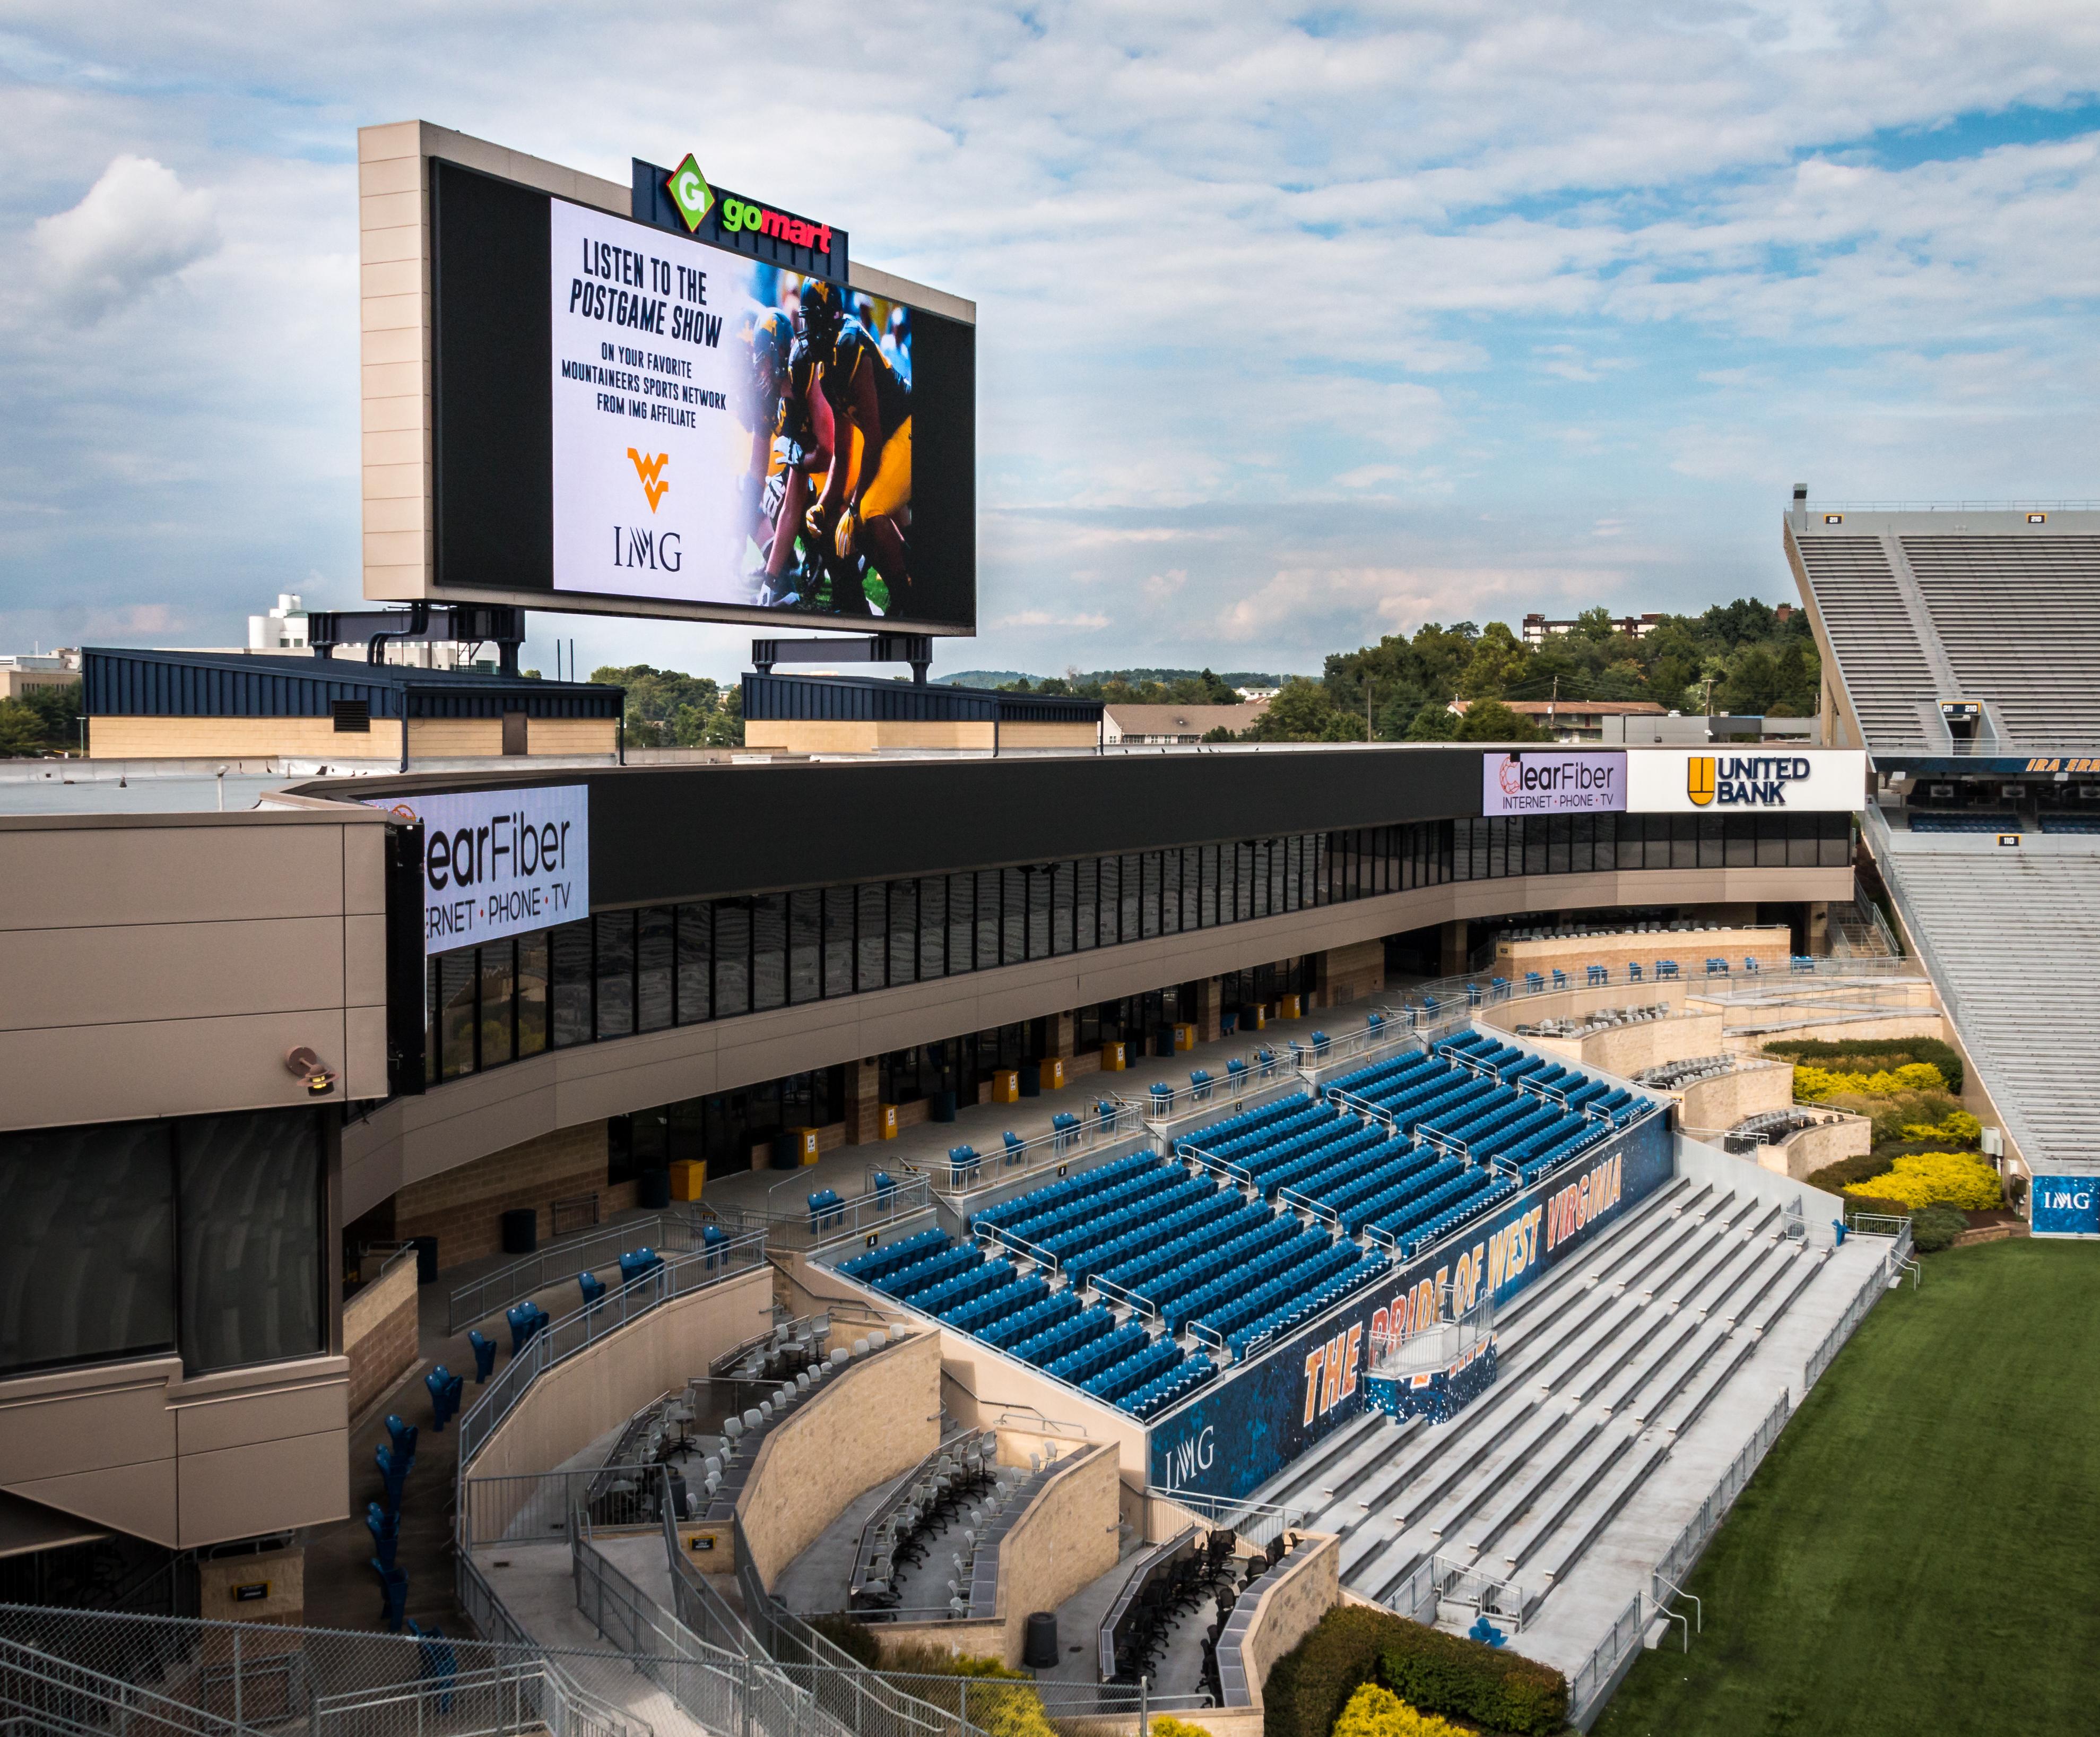 Puskar Stadium Scoreboard 8-30-17-8-8